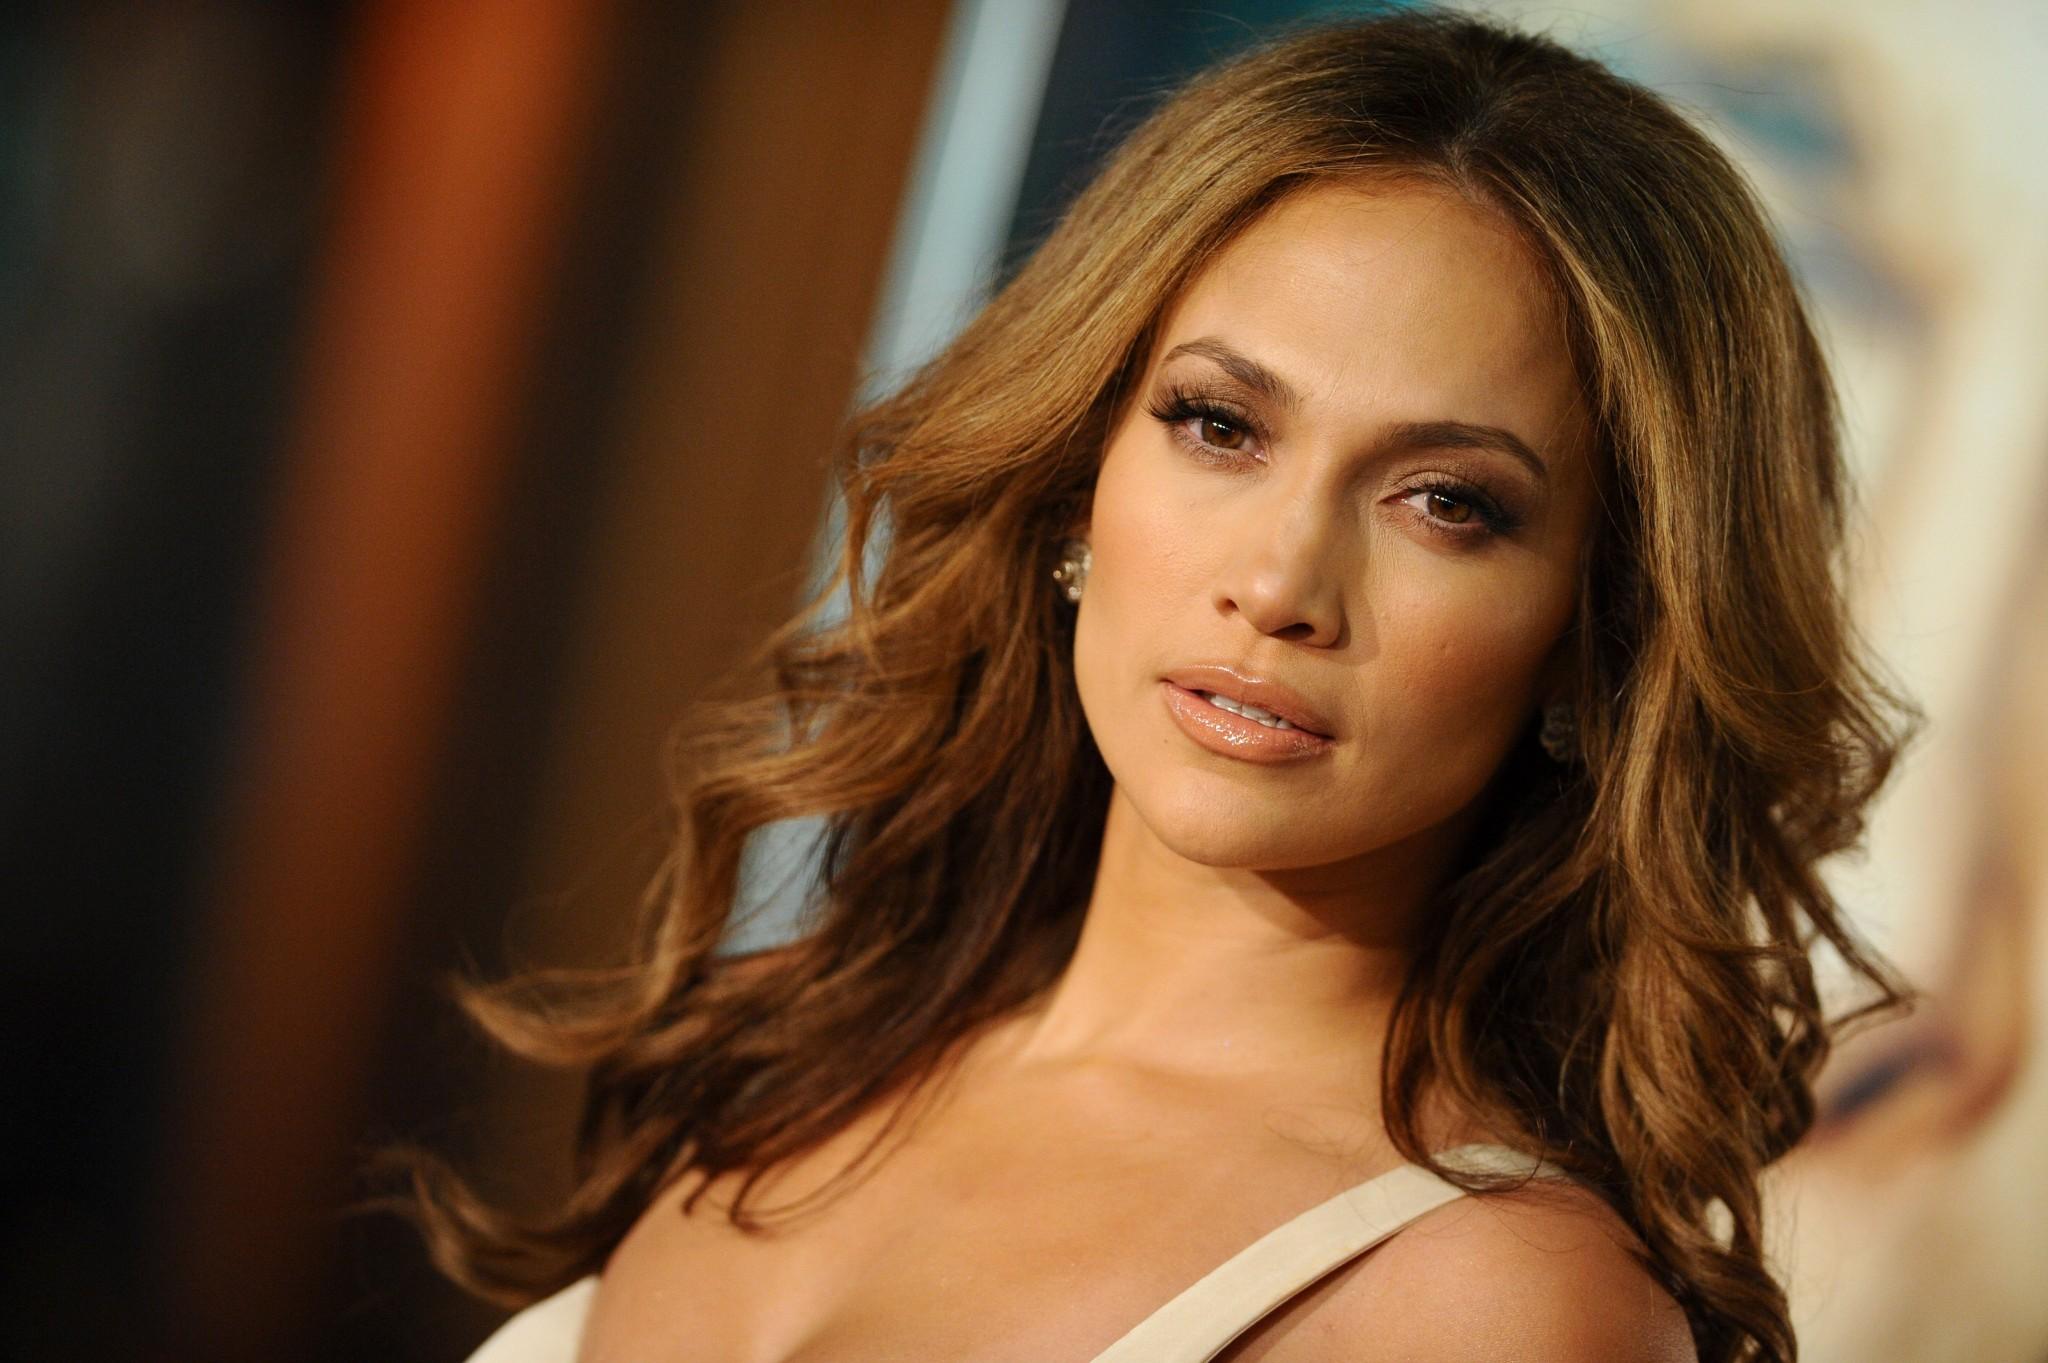 Jennifer-Lopez-Best-Picture-Wallpaper